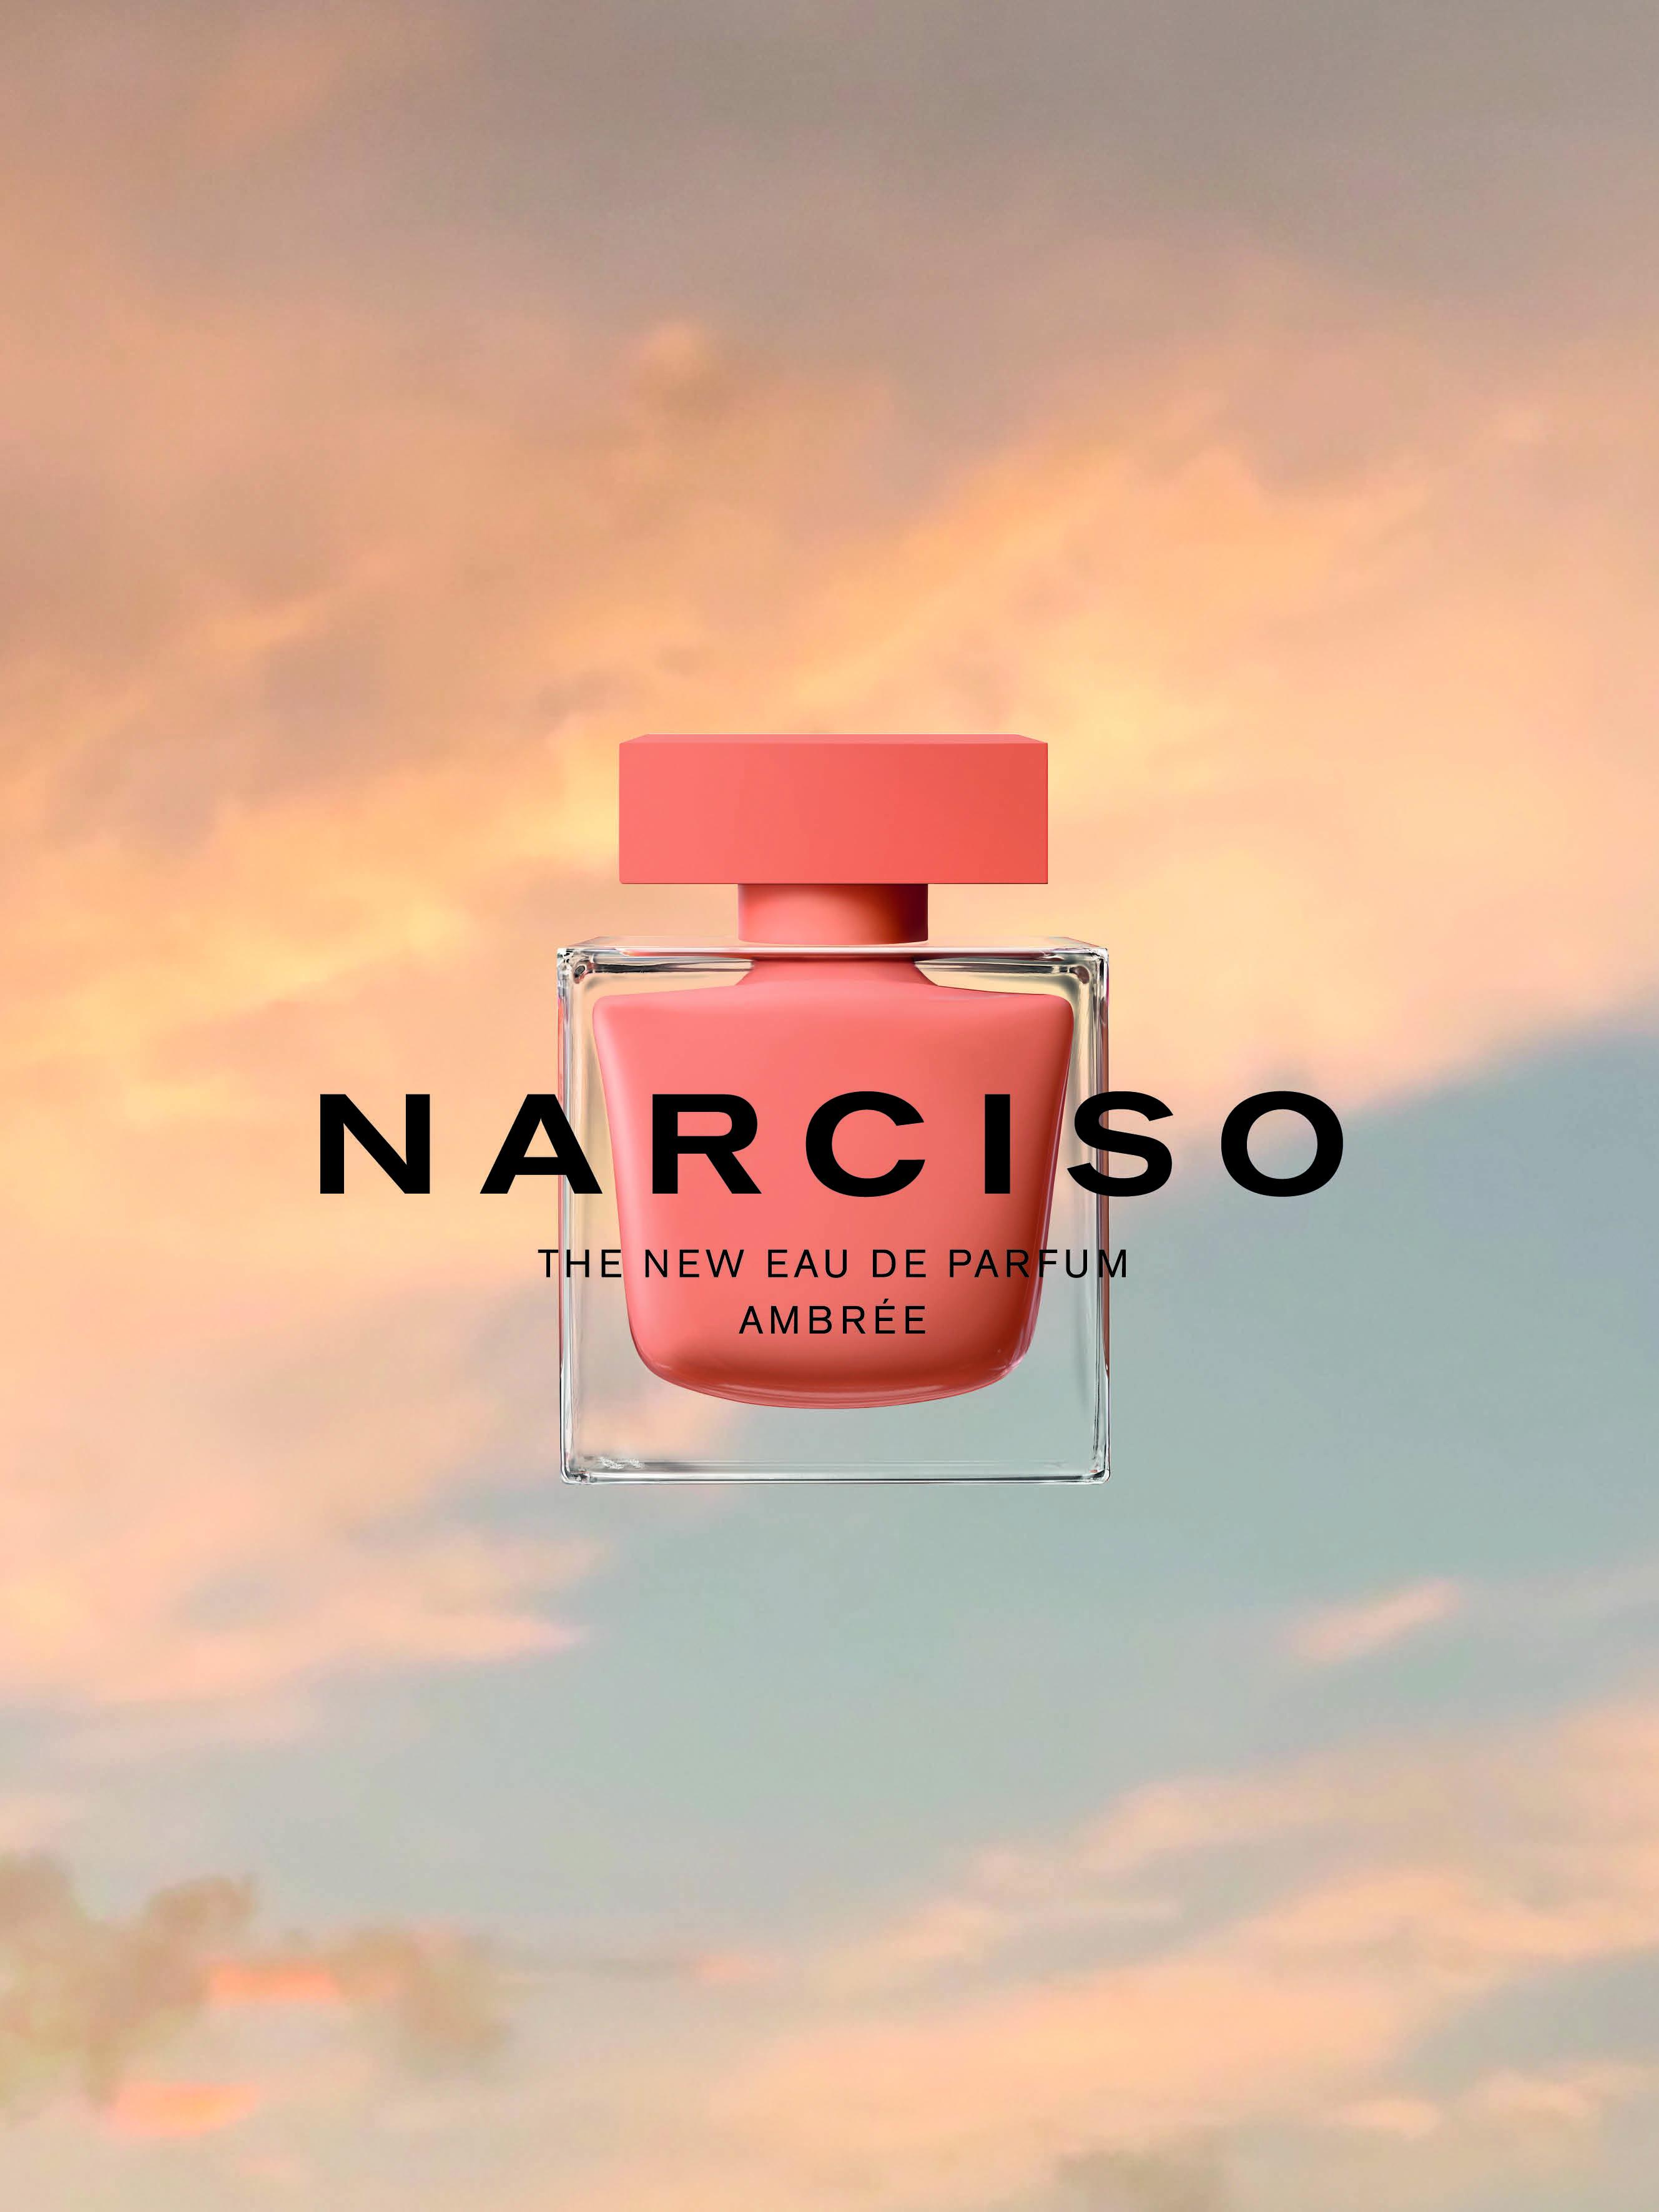 NR NARCISO EDP AMBREE EDP CREATIVE PACKSHOT English 0,75 - Narciso,  el nuevo  eau de parfum  Ambrée